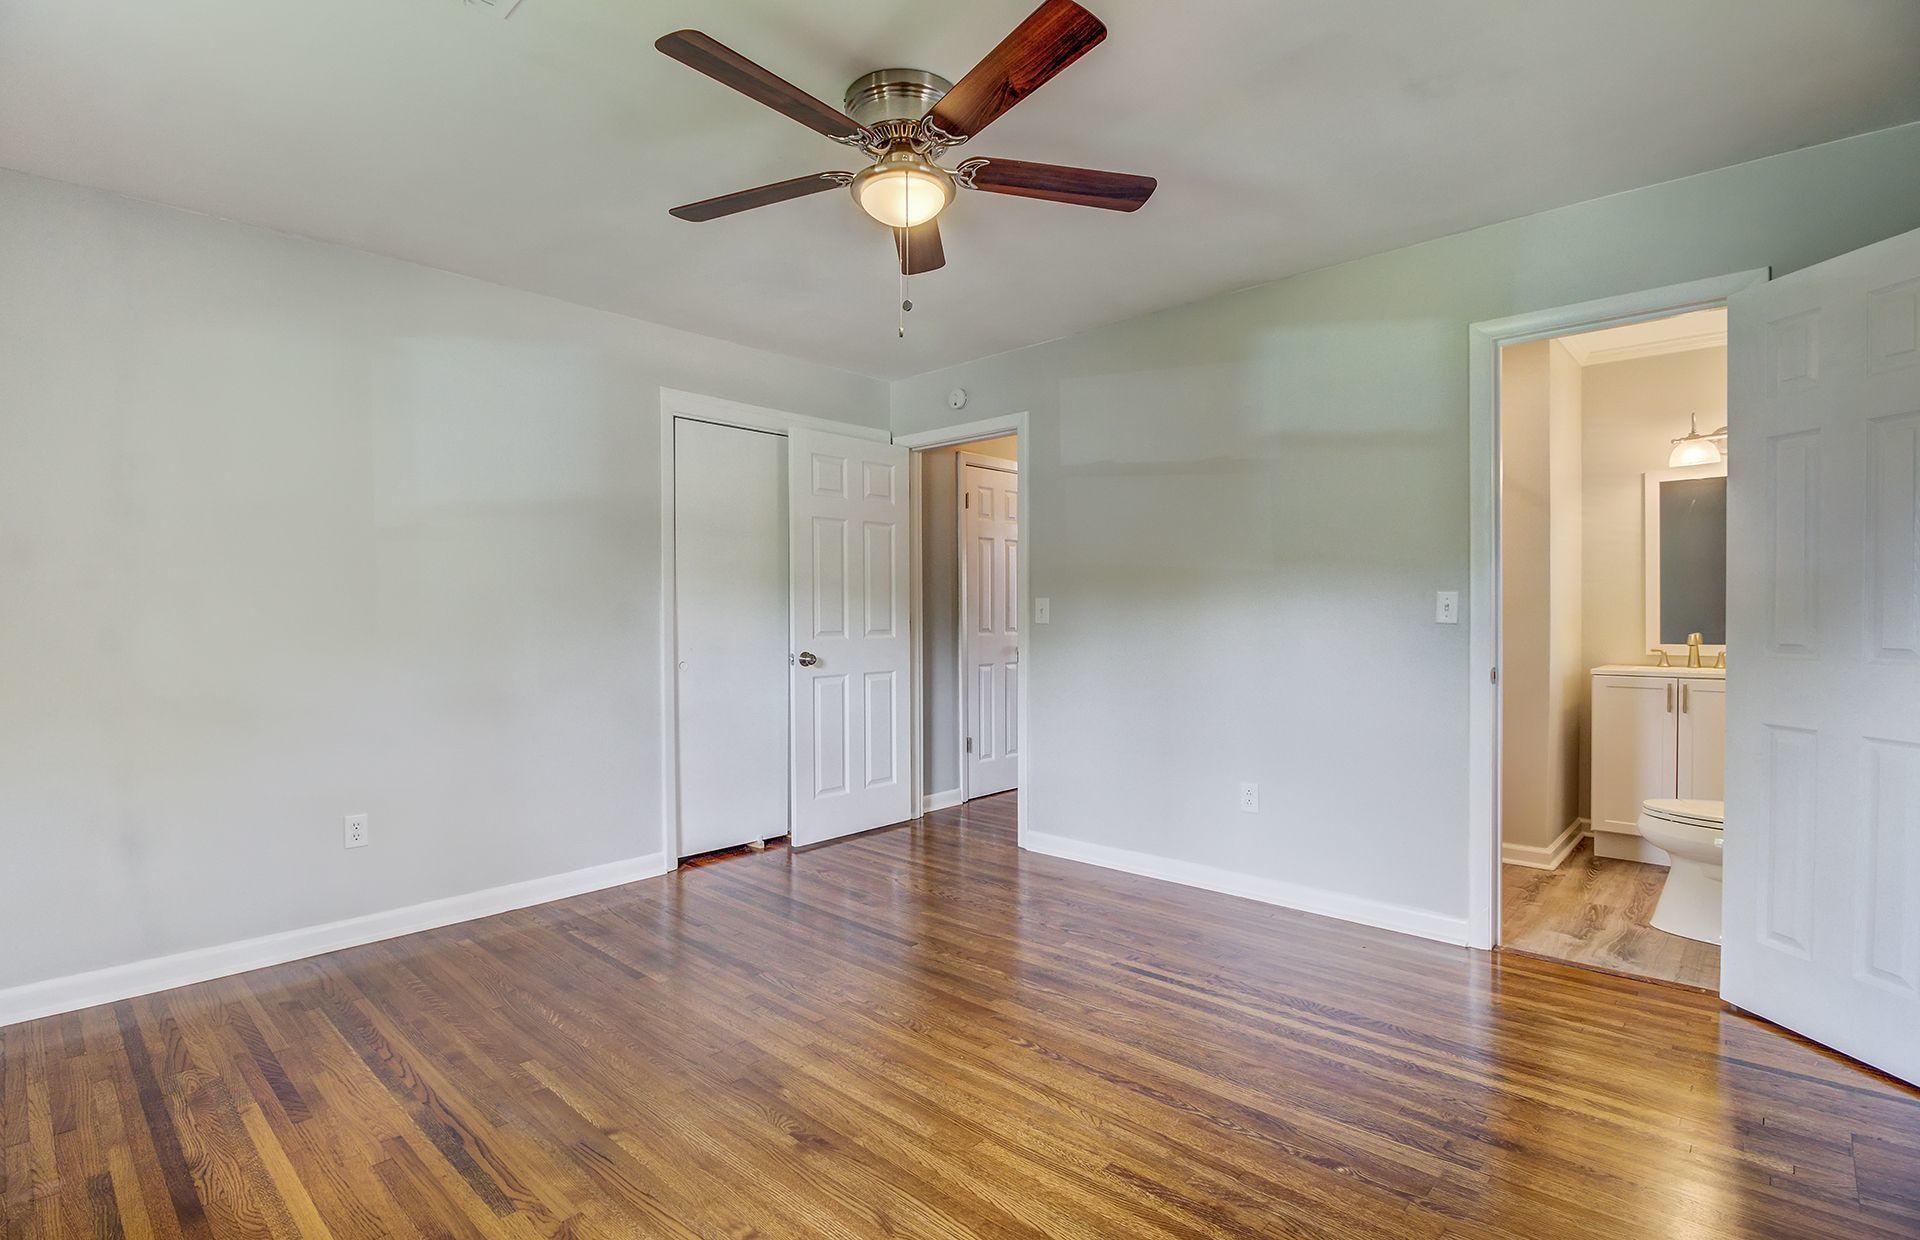 Belvedere Estates Homes For Sale - 6010 Ridgecrest, Hanahan, SC - 21